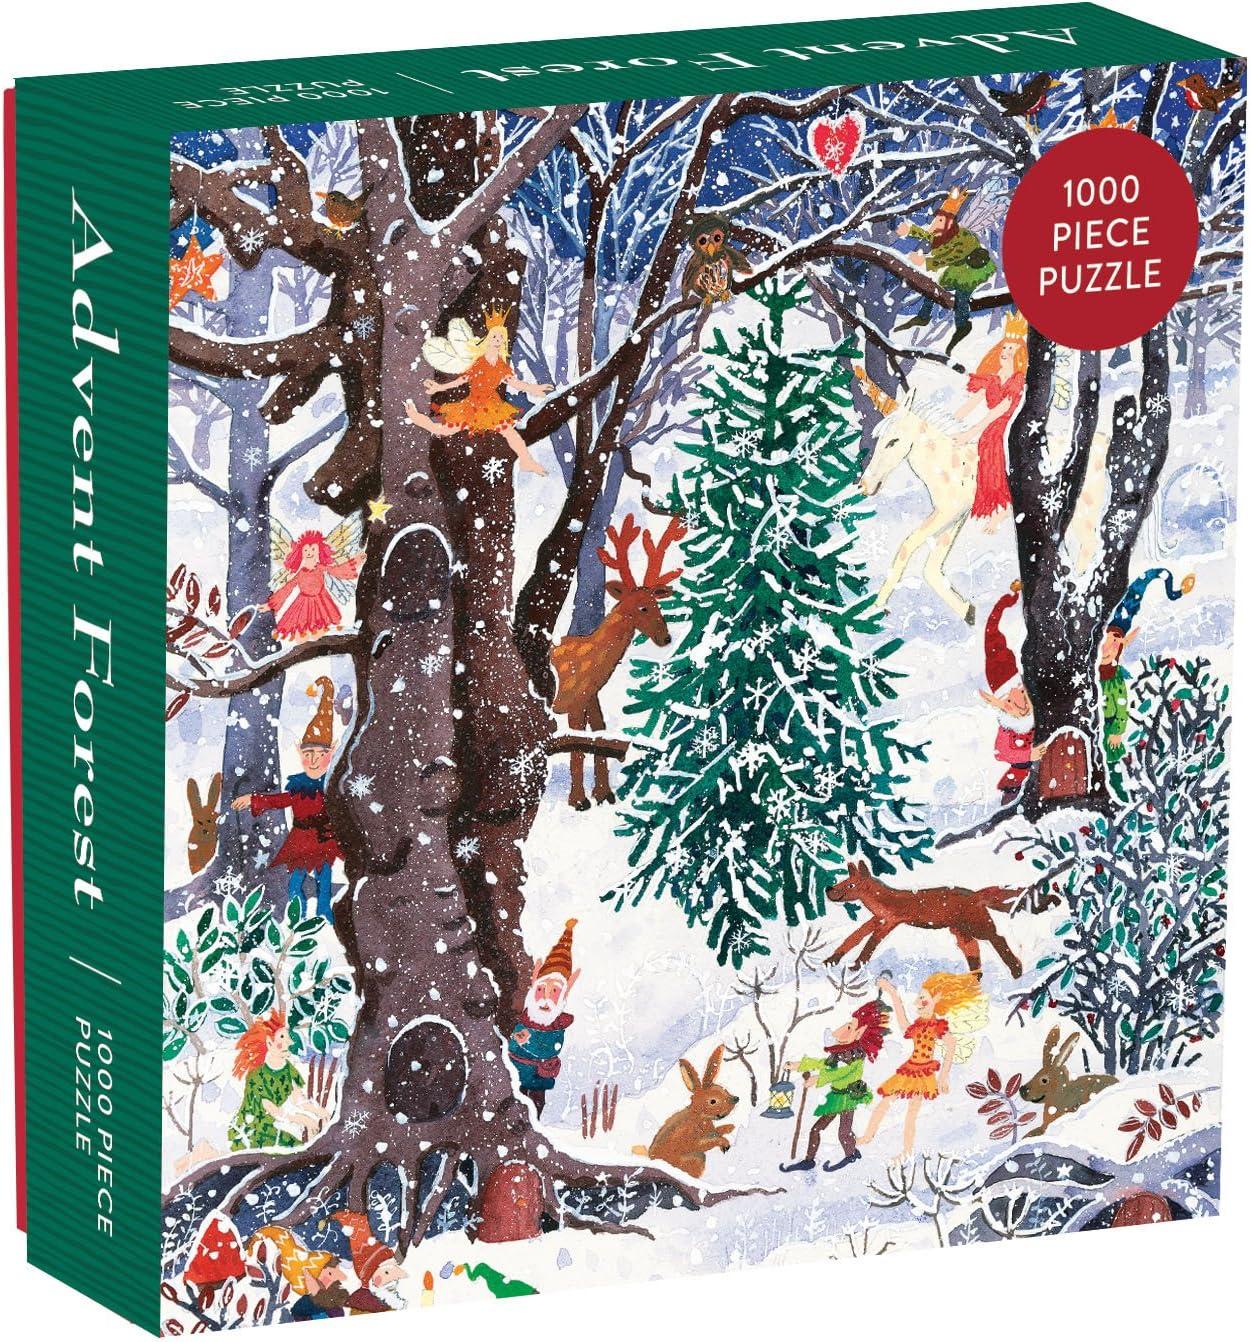 Advent Forest 1000 Piece Jigsaw Puzzle – Fun Indoor Activit